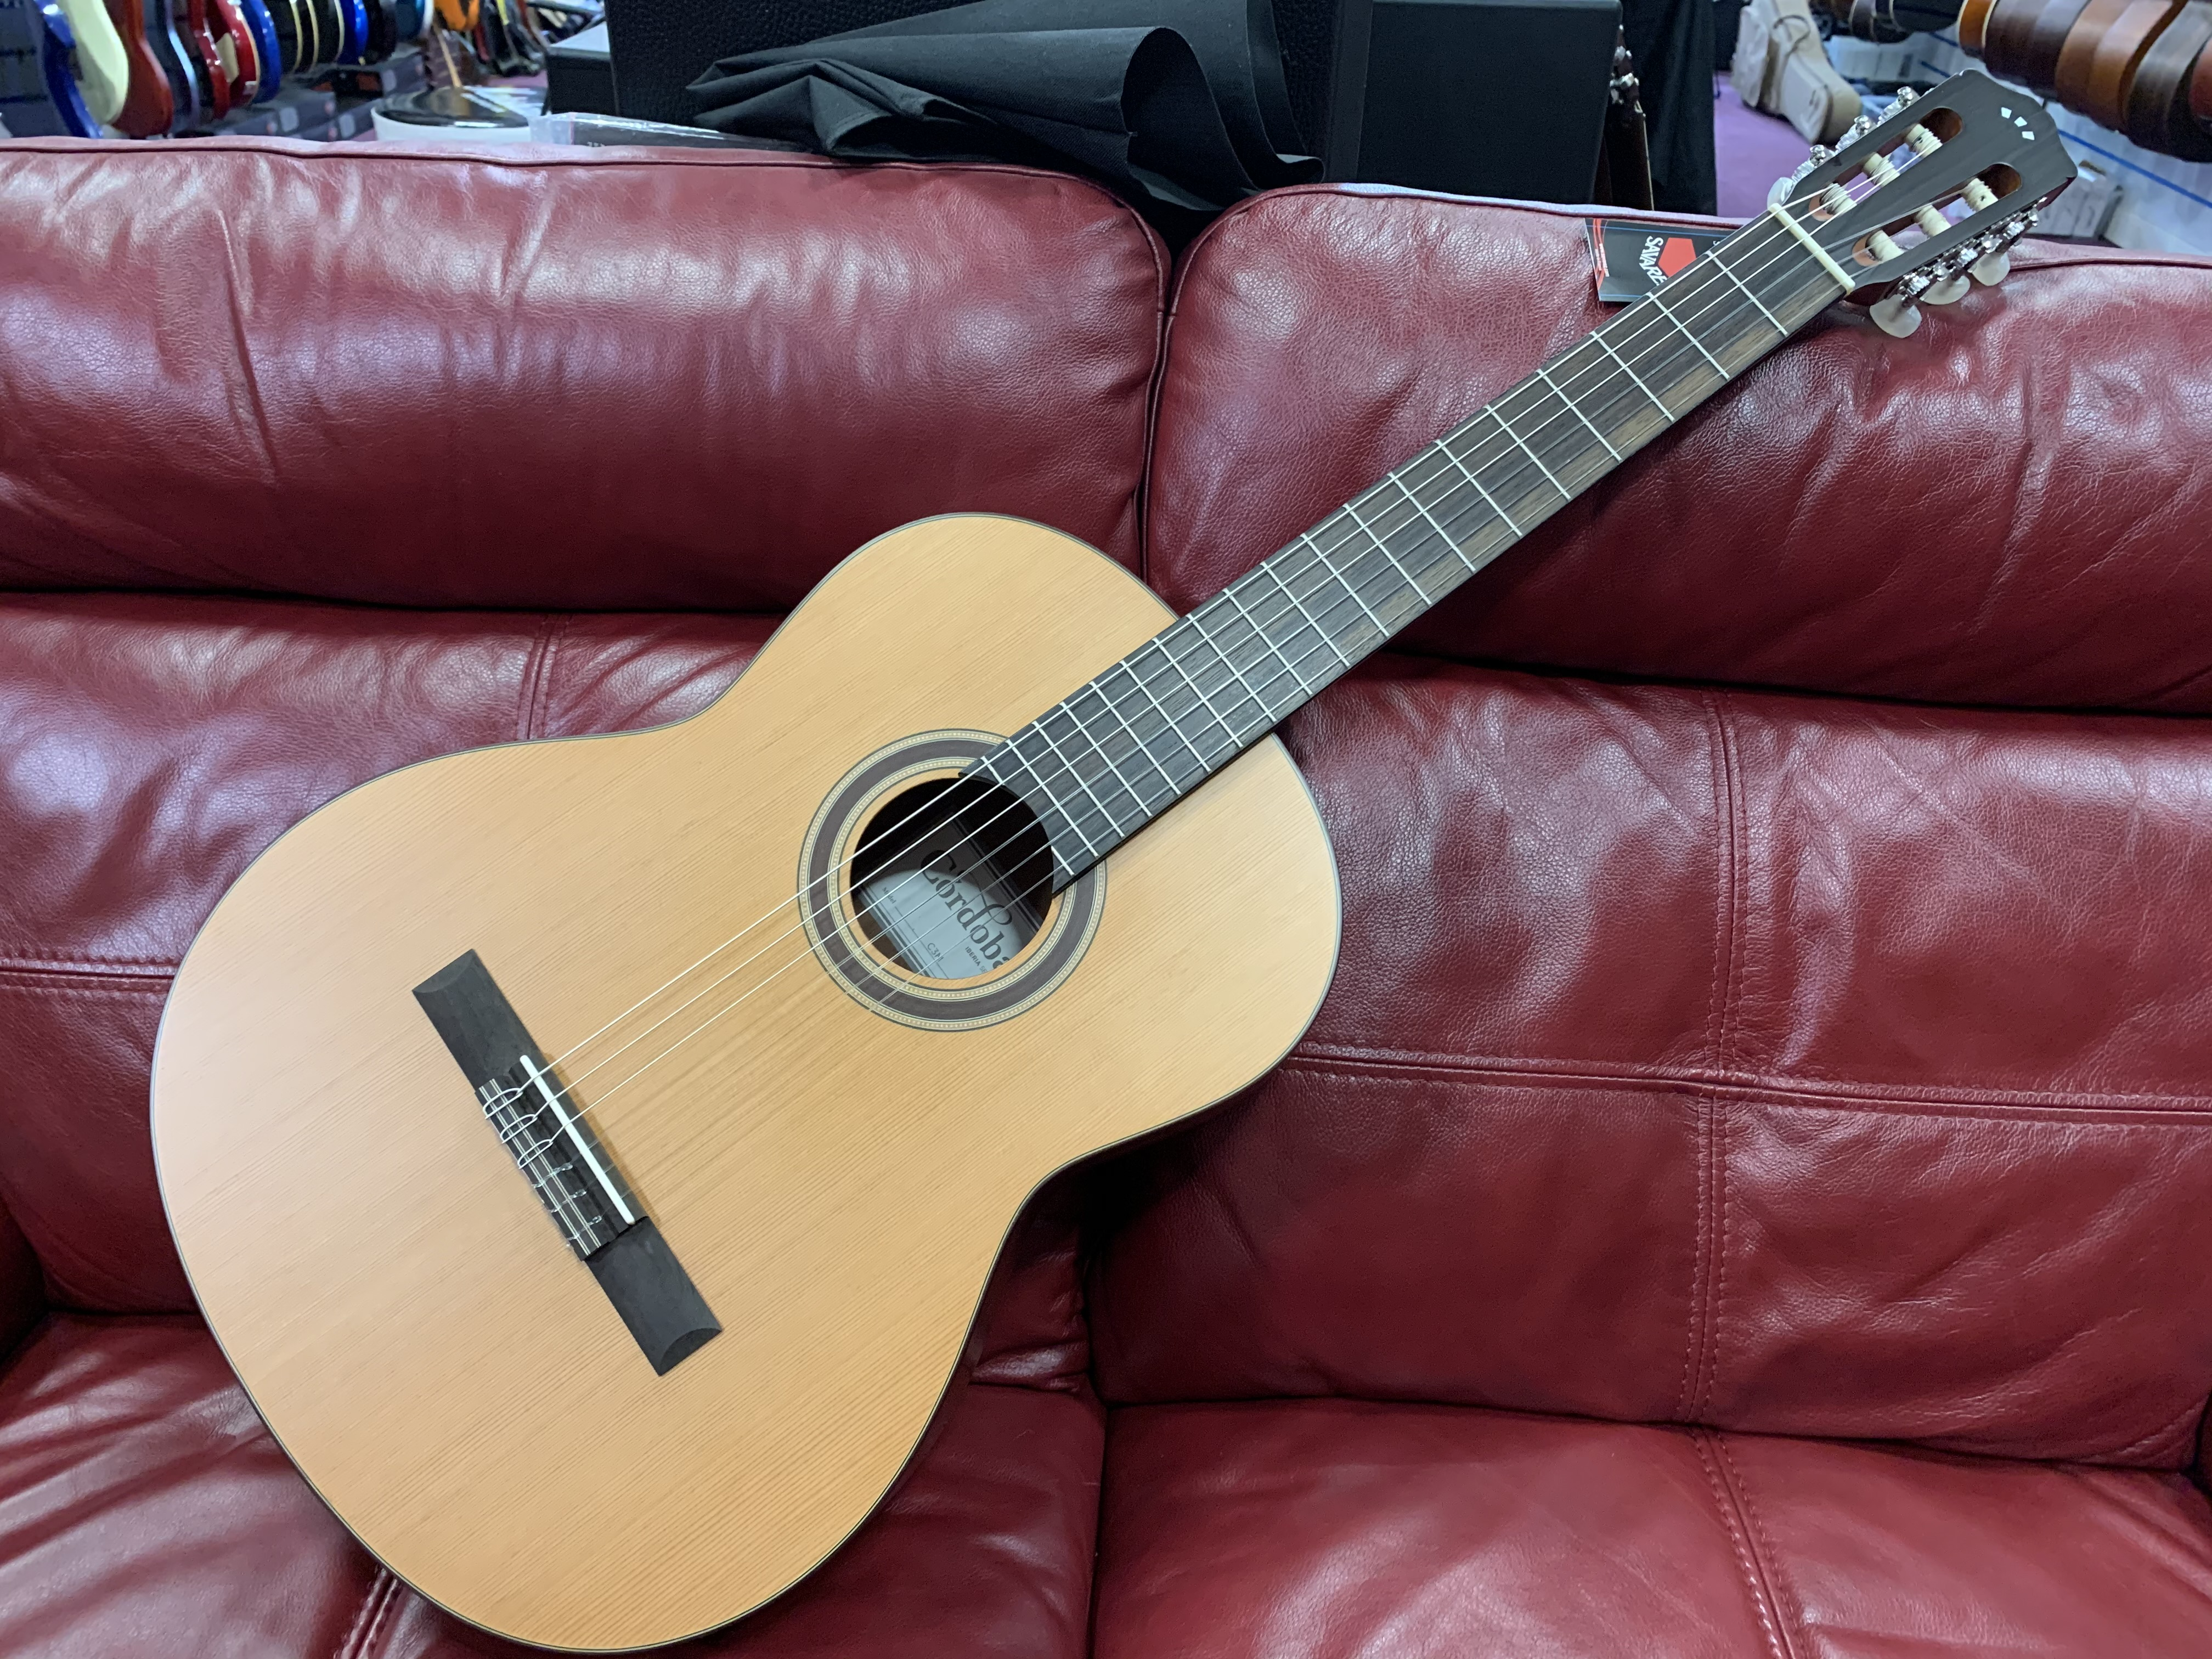 Córdoba C3M Classical Guitar (Lockdown Special RRP £199)